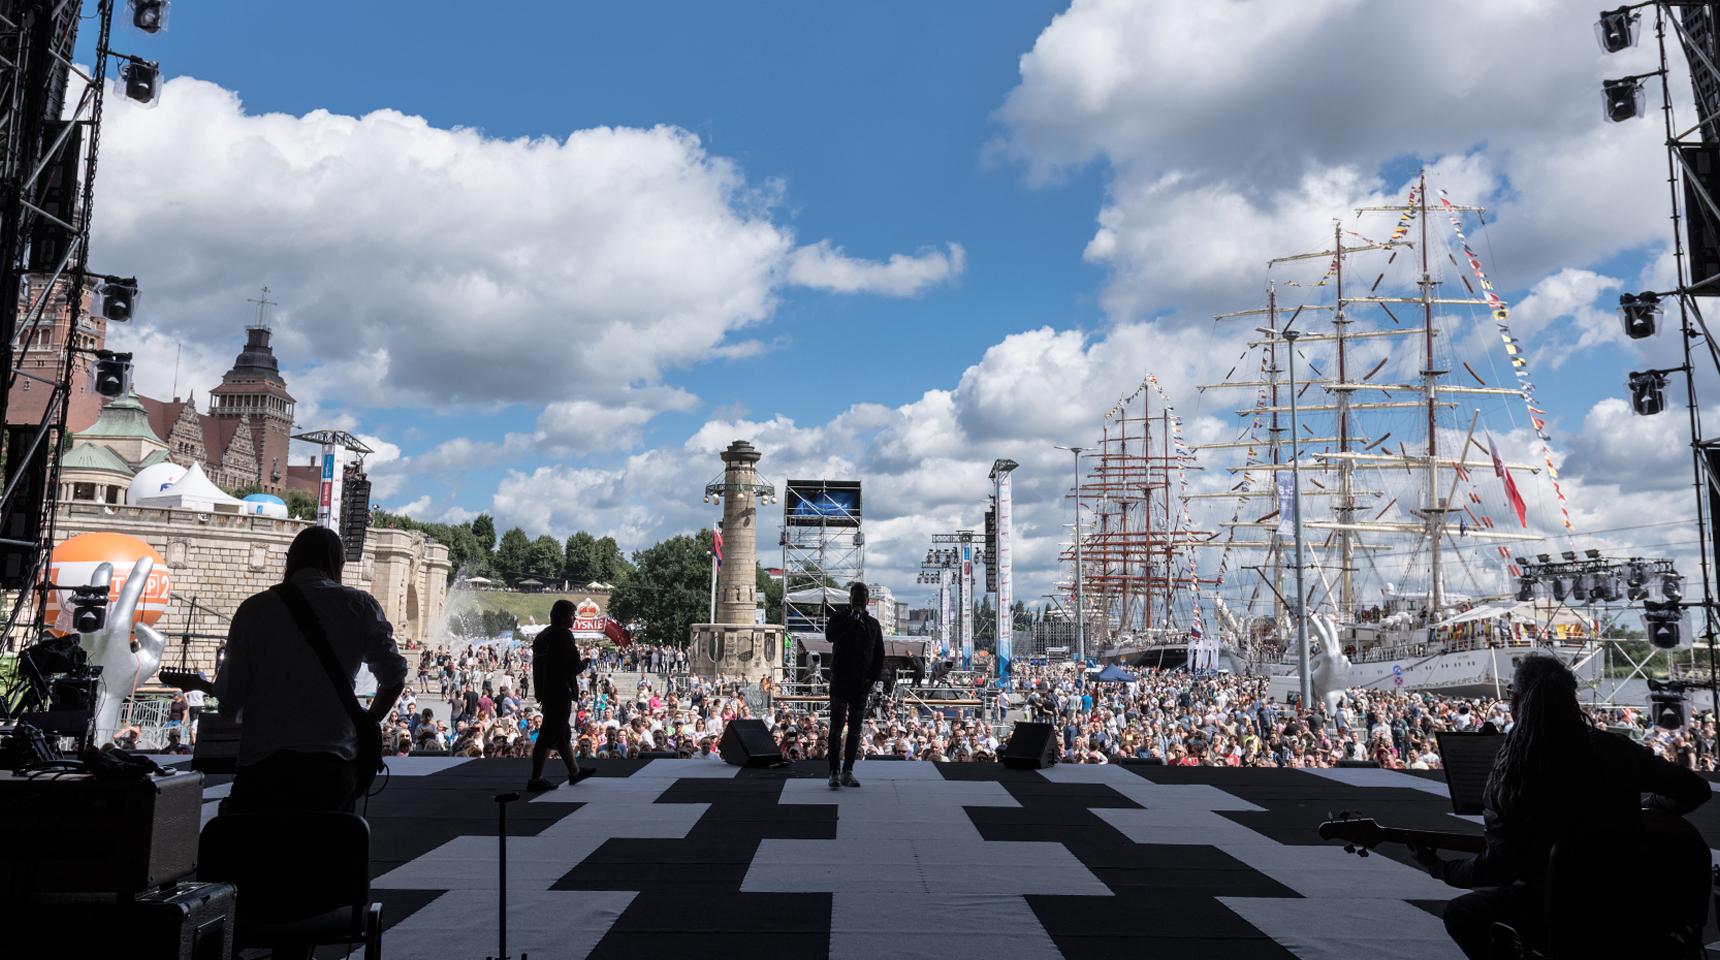 The Tall Ships Races 2017 - Finał regat wielkich żaglowców